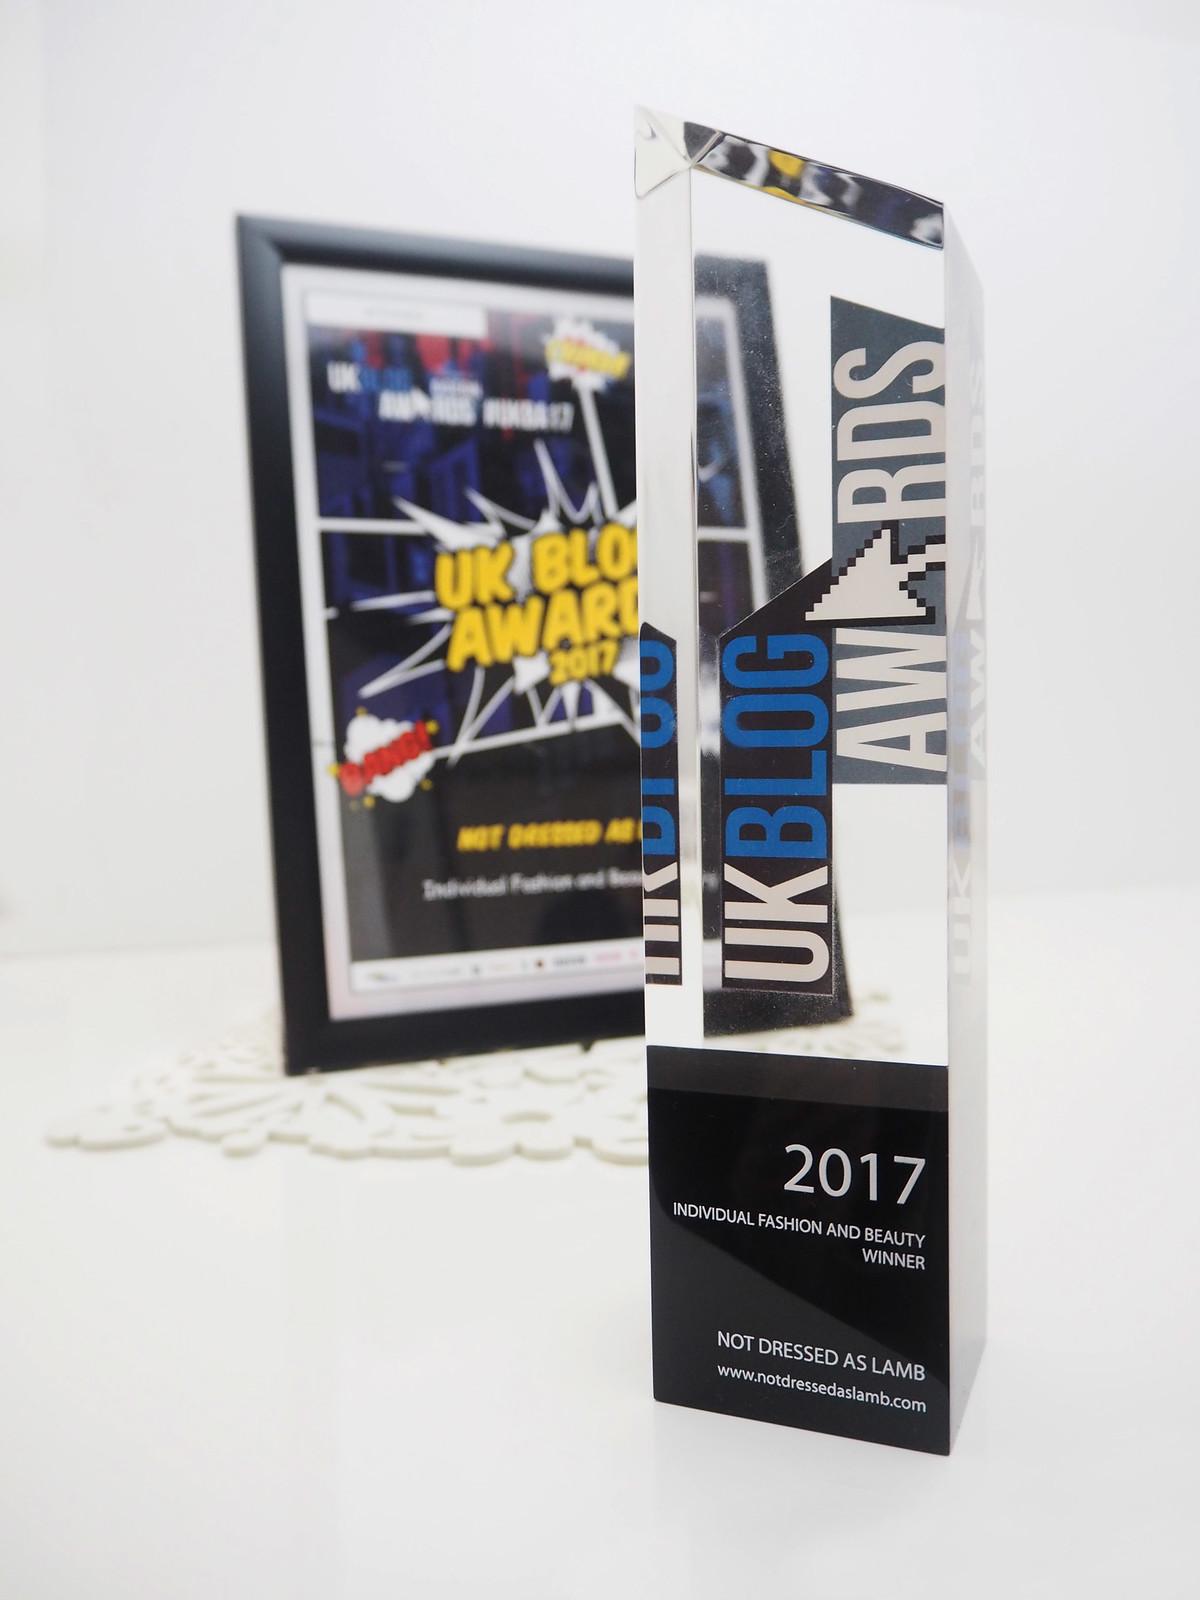 UK Blog Awards Individual Fashion & Beauty Winner 2017 trophy, Not Dressed As Lamb